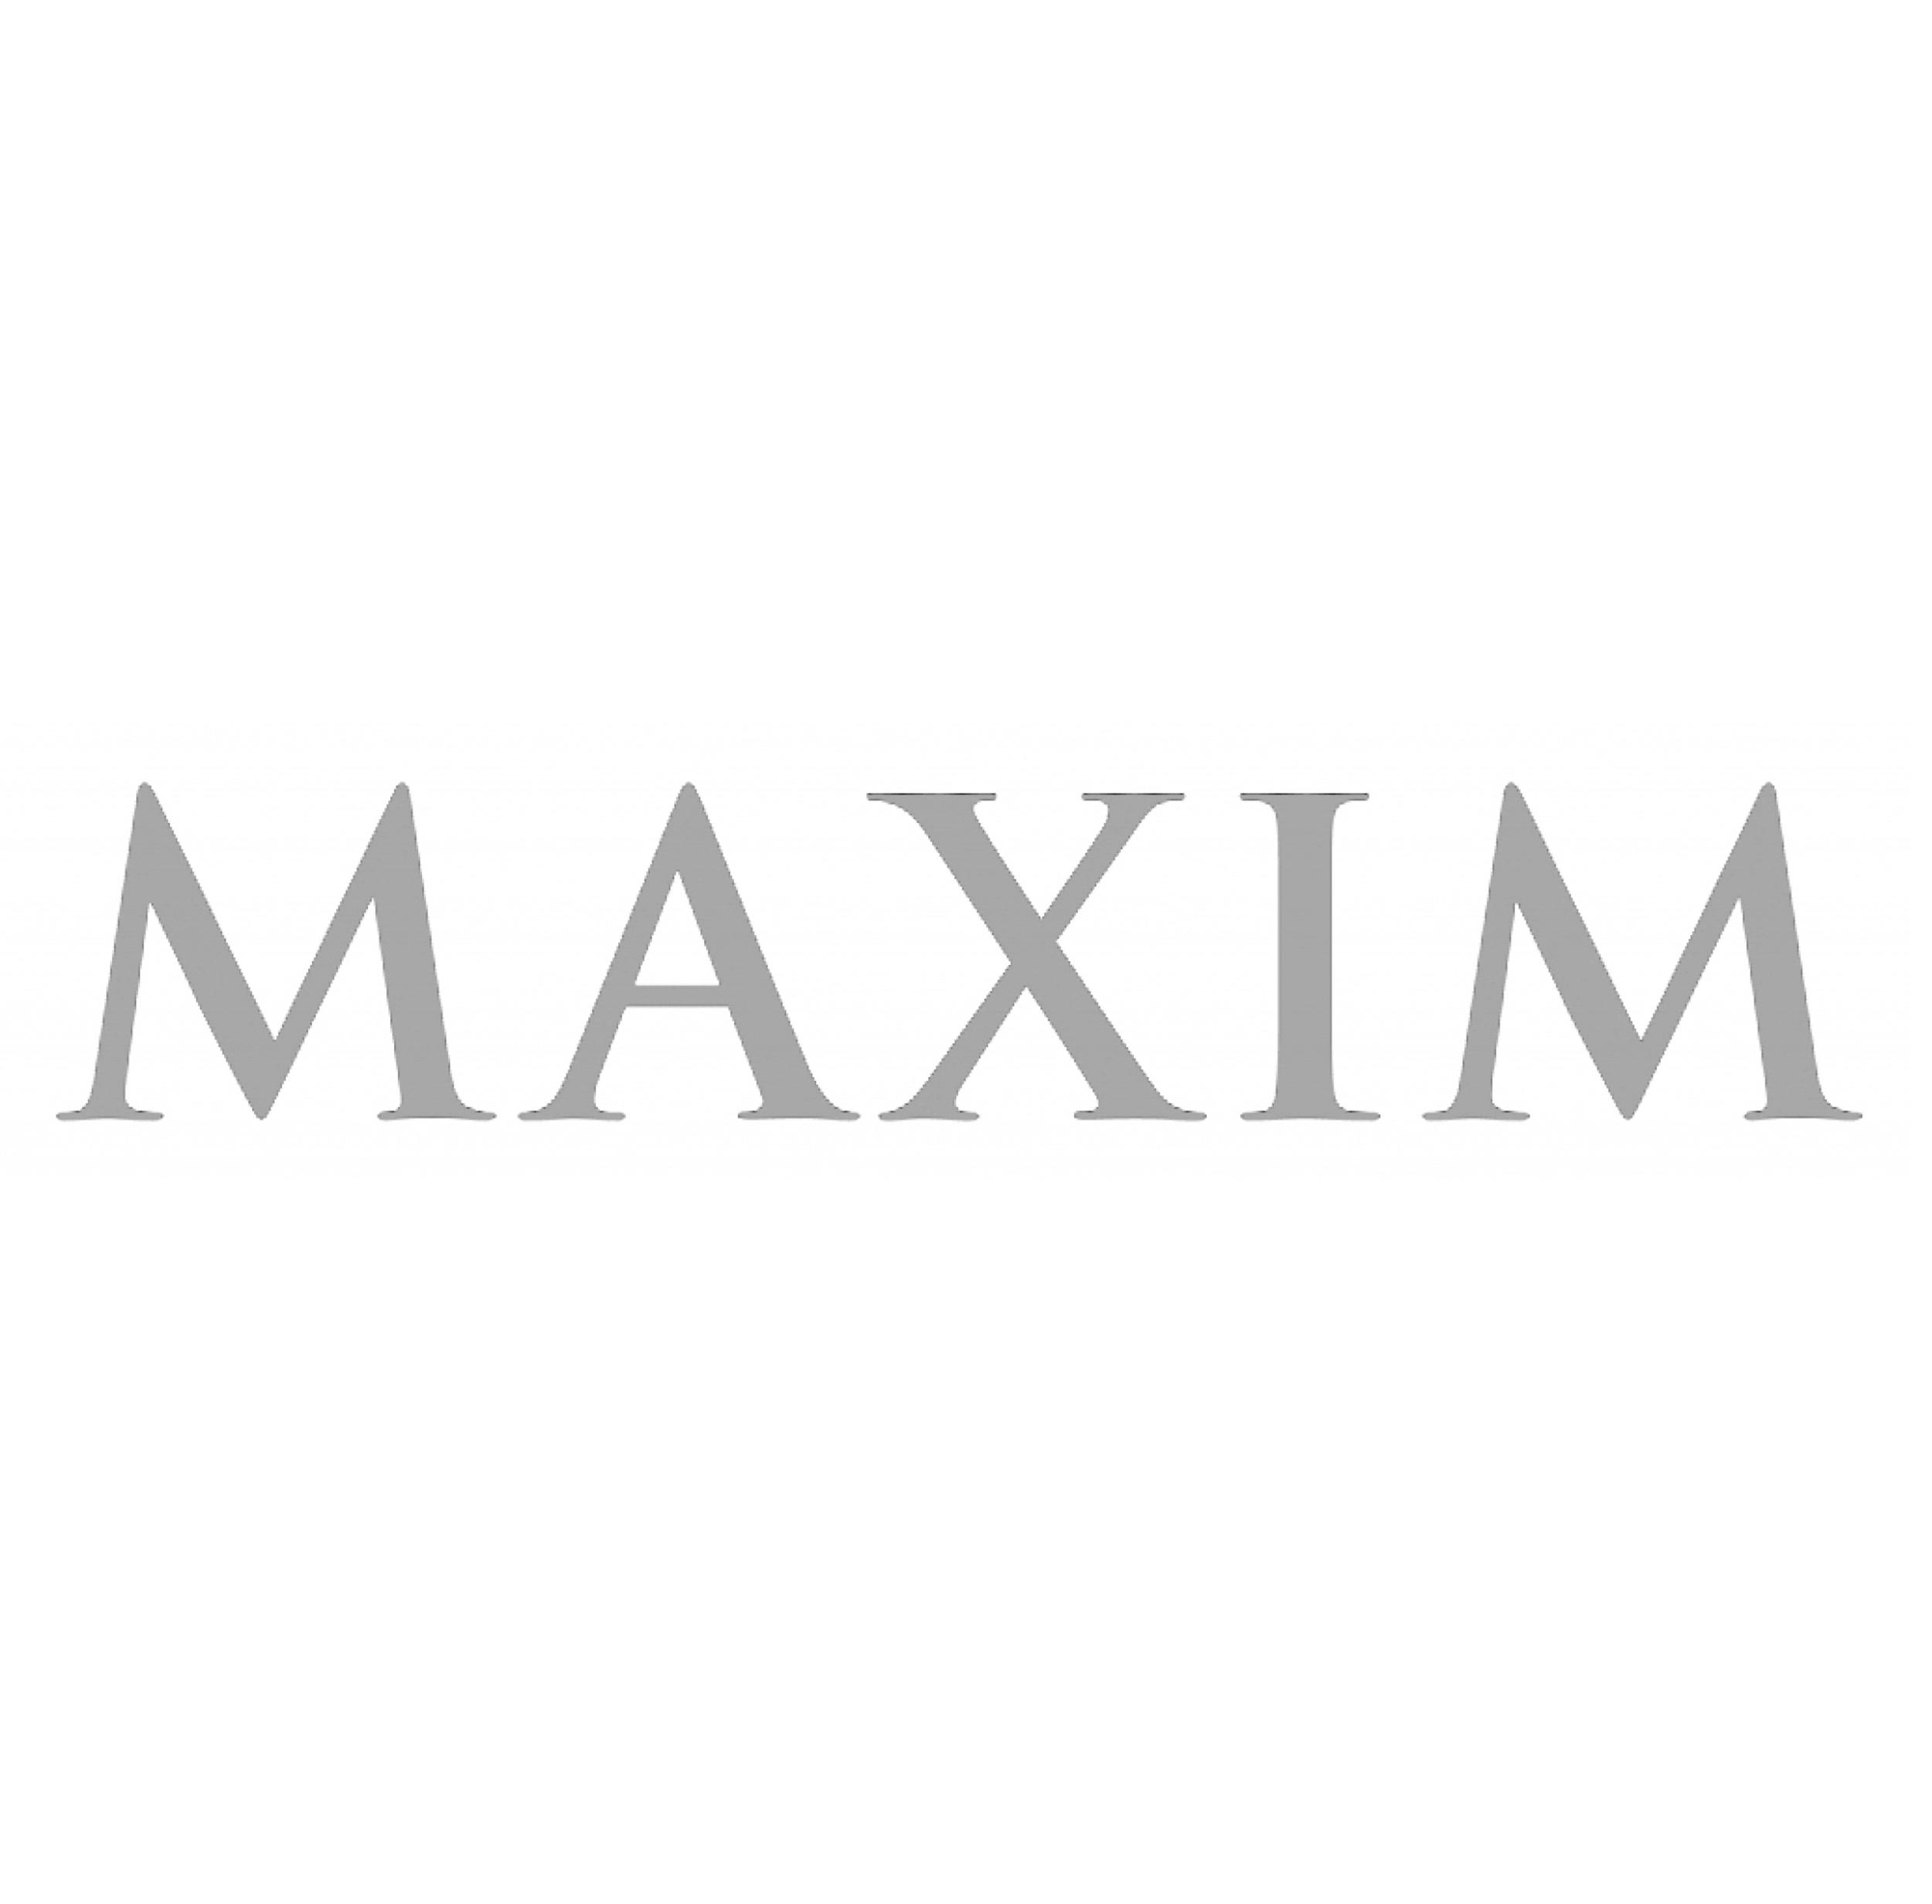 maxim-logo-480.jpg